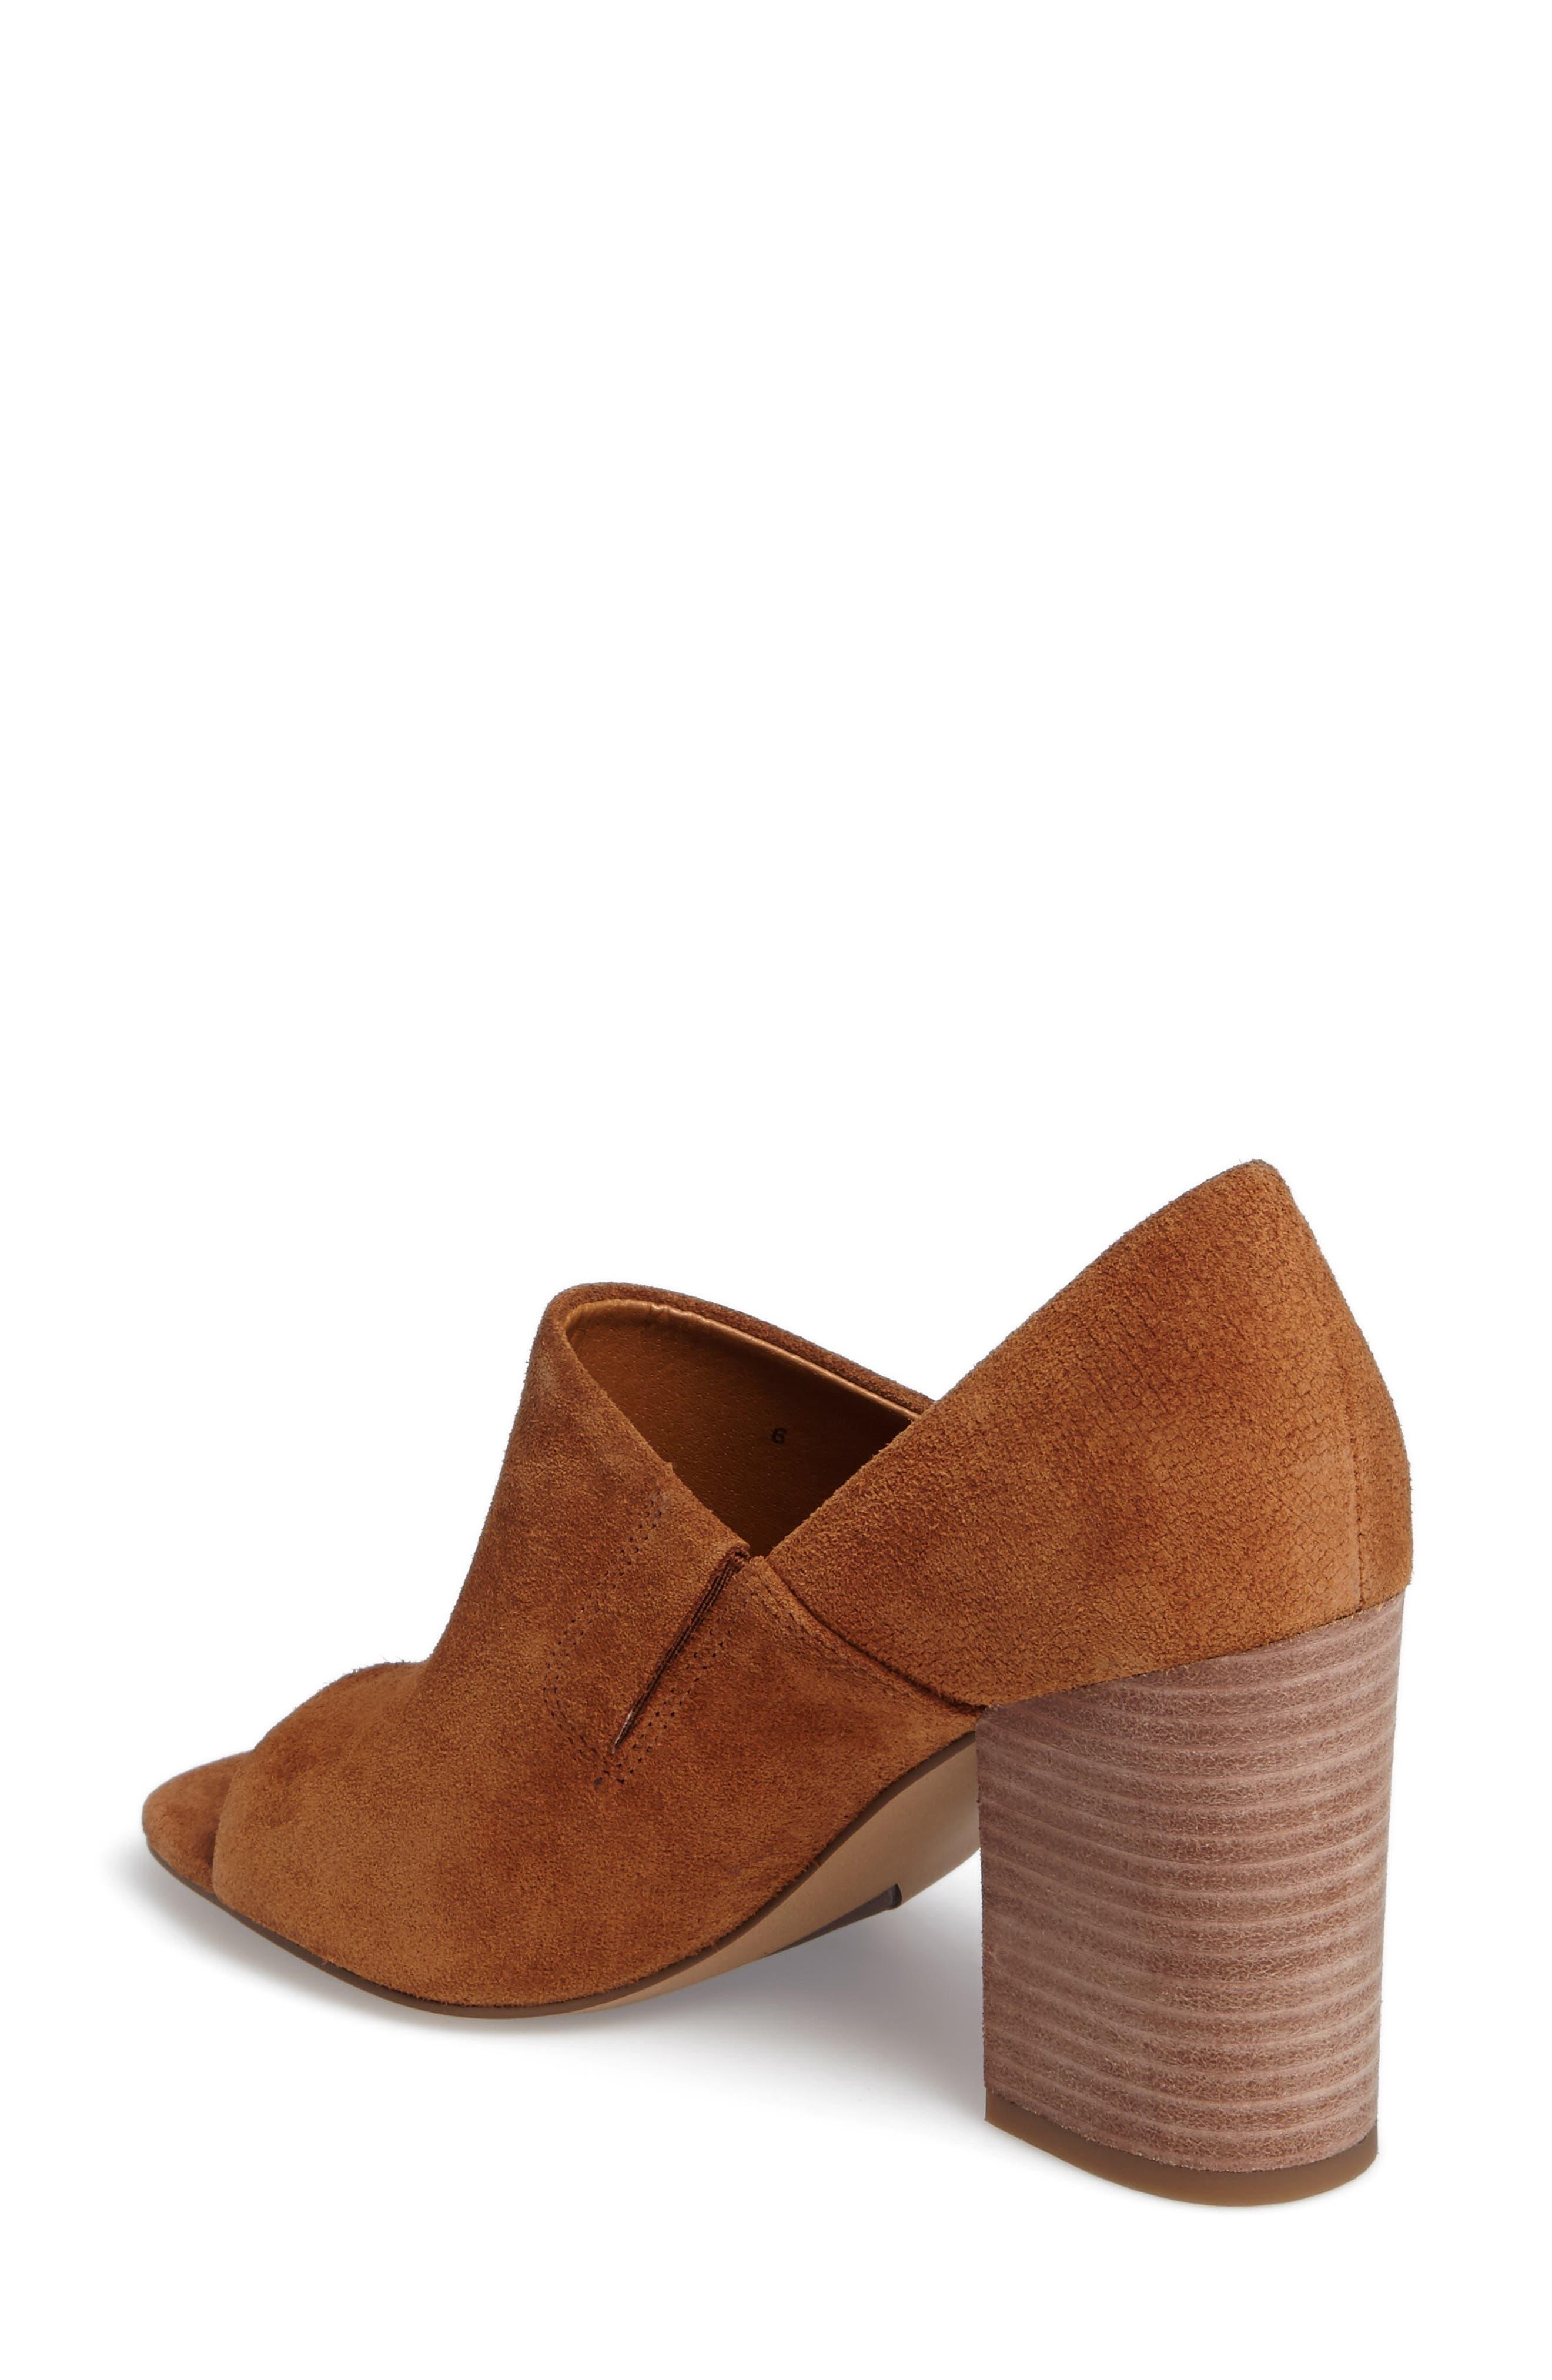 Alternate Image 2  - SARTO by Franco Sarto Ellison Block Heel Sandal (Women)